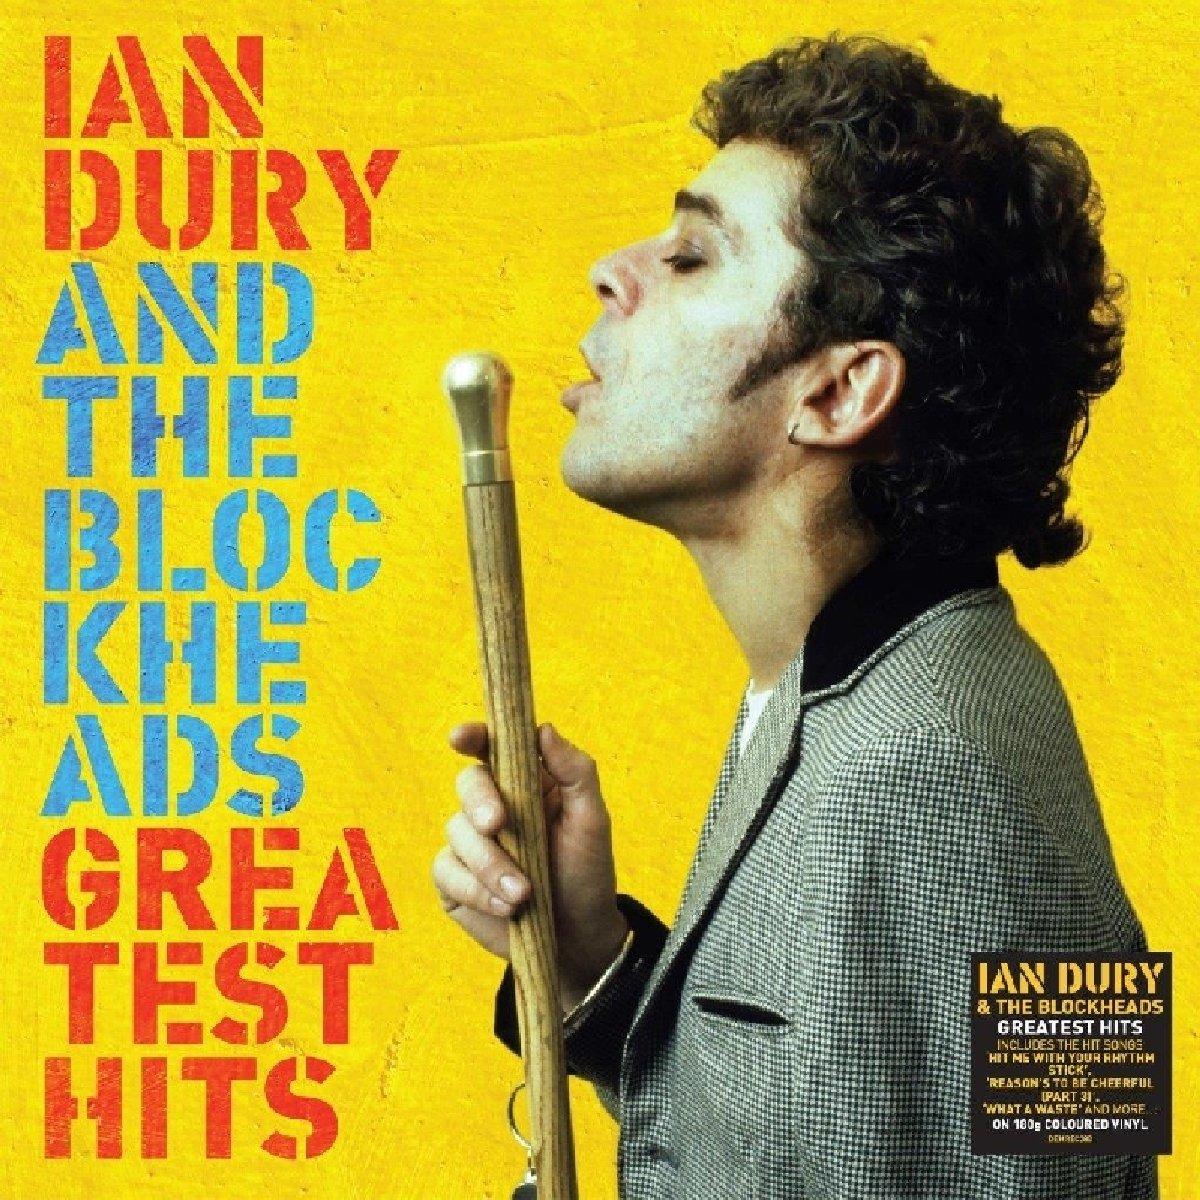 Ian Dury Amp The Blockheads Greatest Hits Vinyl Lp Now 163